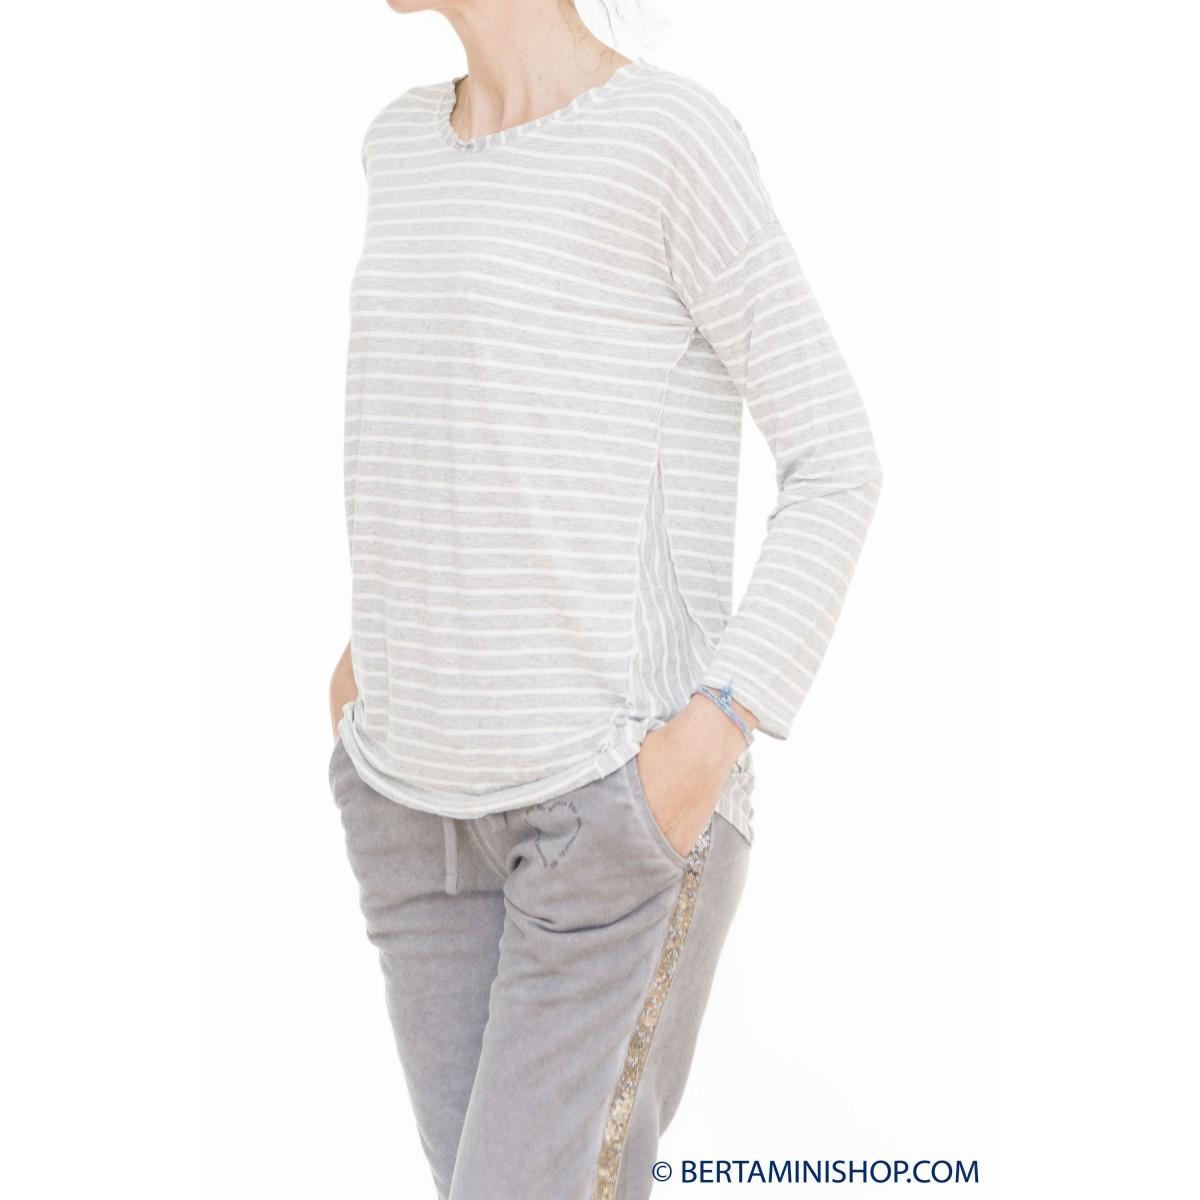 T Shirt Better Rich Donna - F36 Tshirt Manica Lunga Rigata